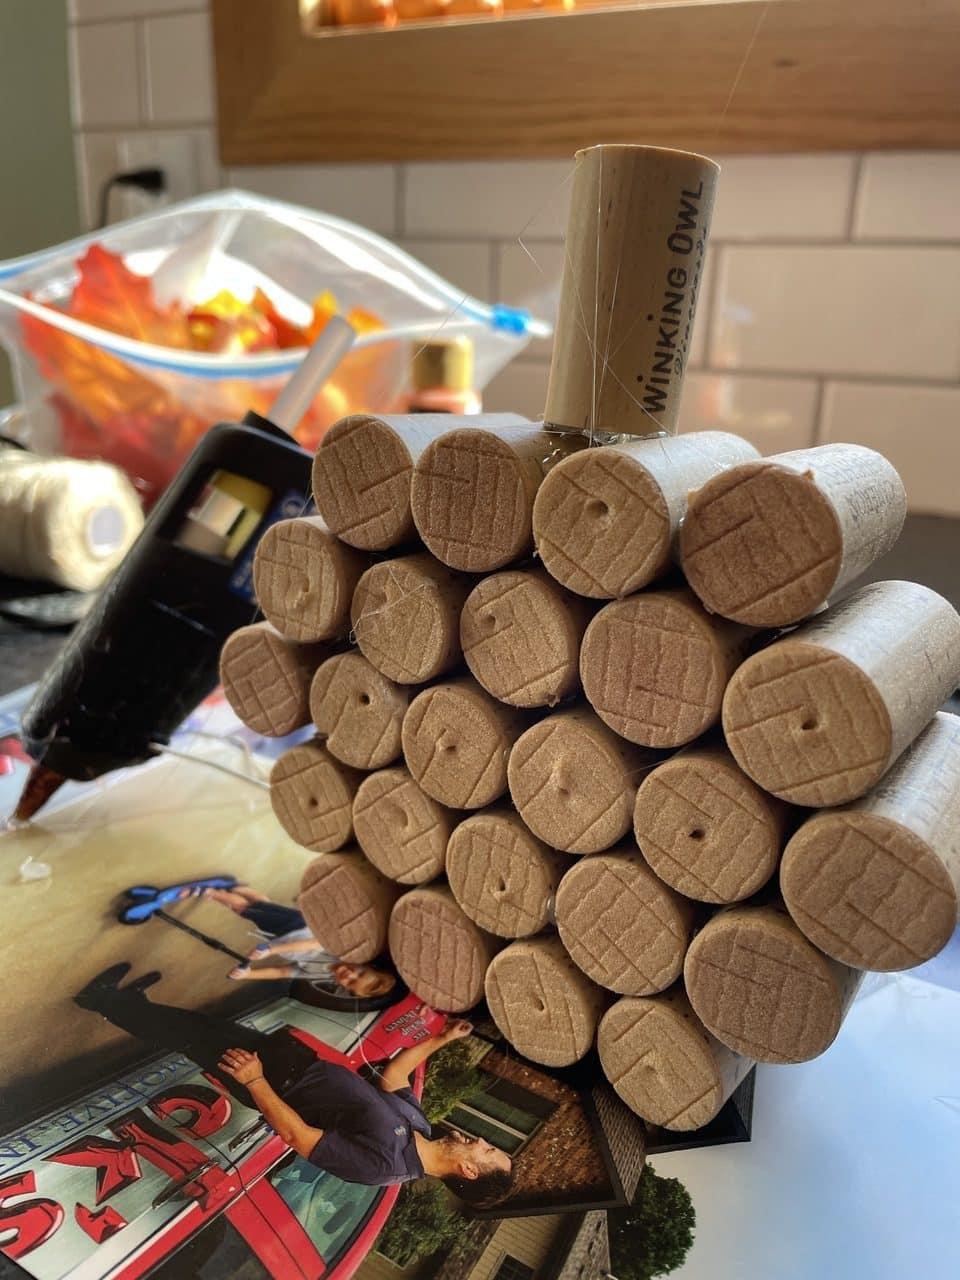 assembling wine corks